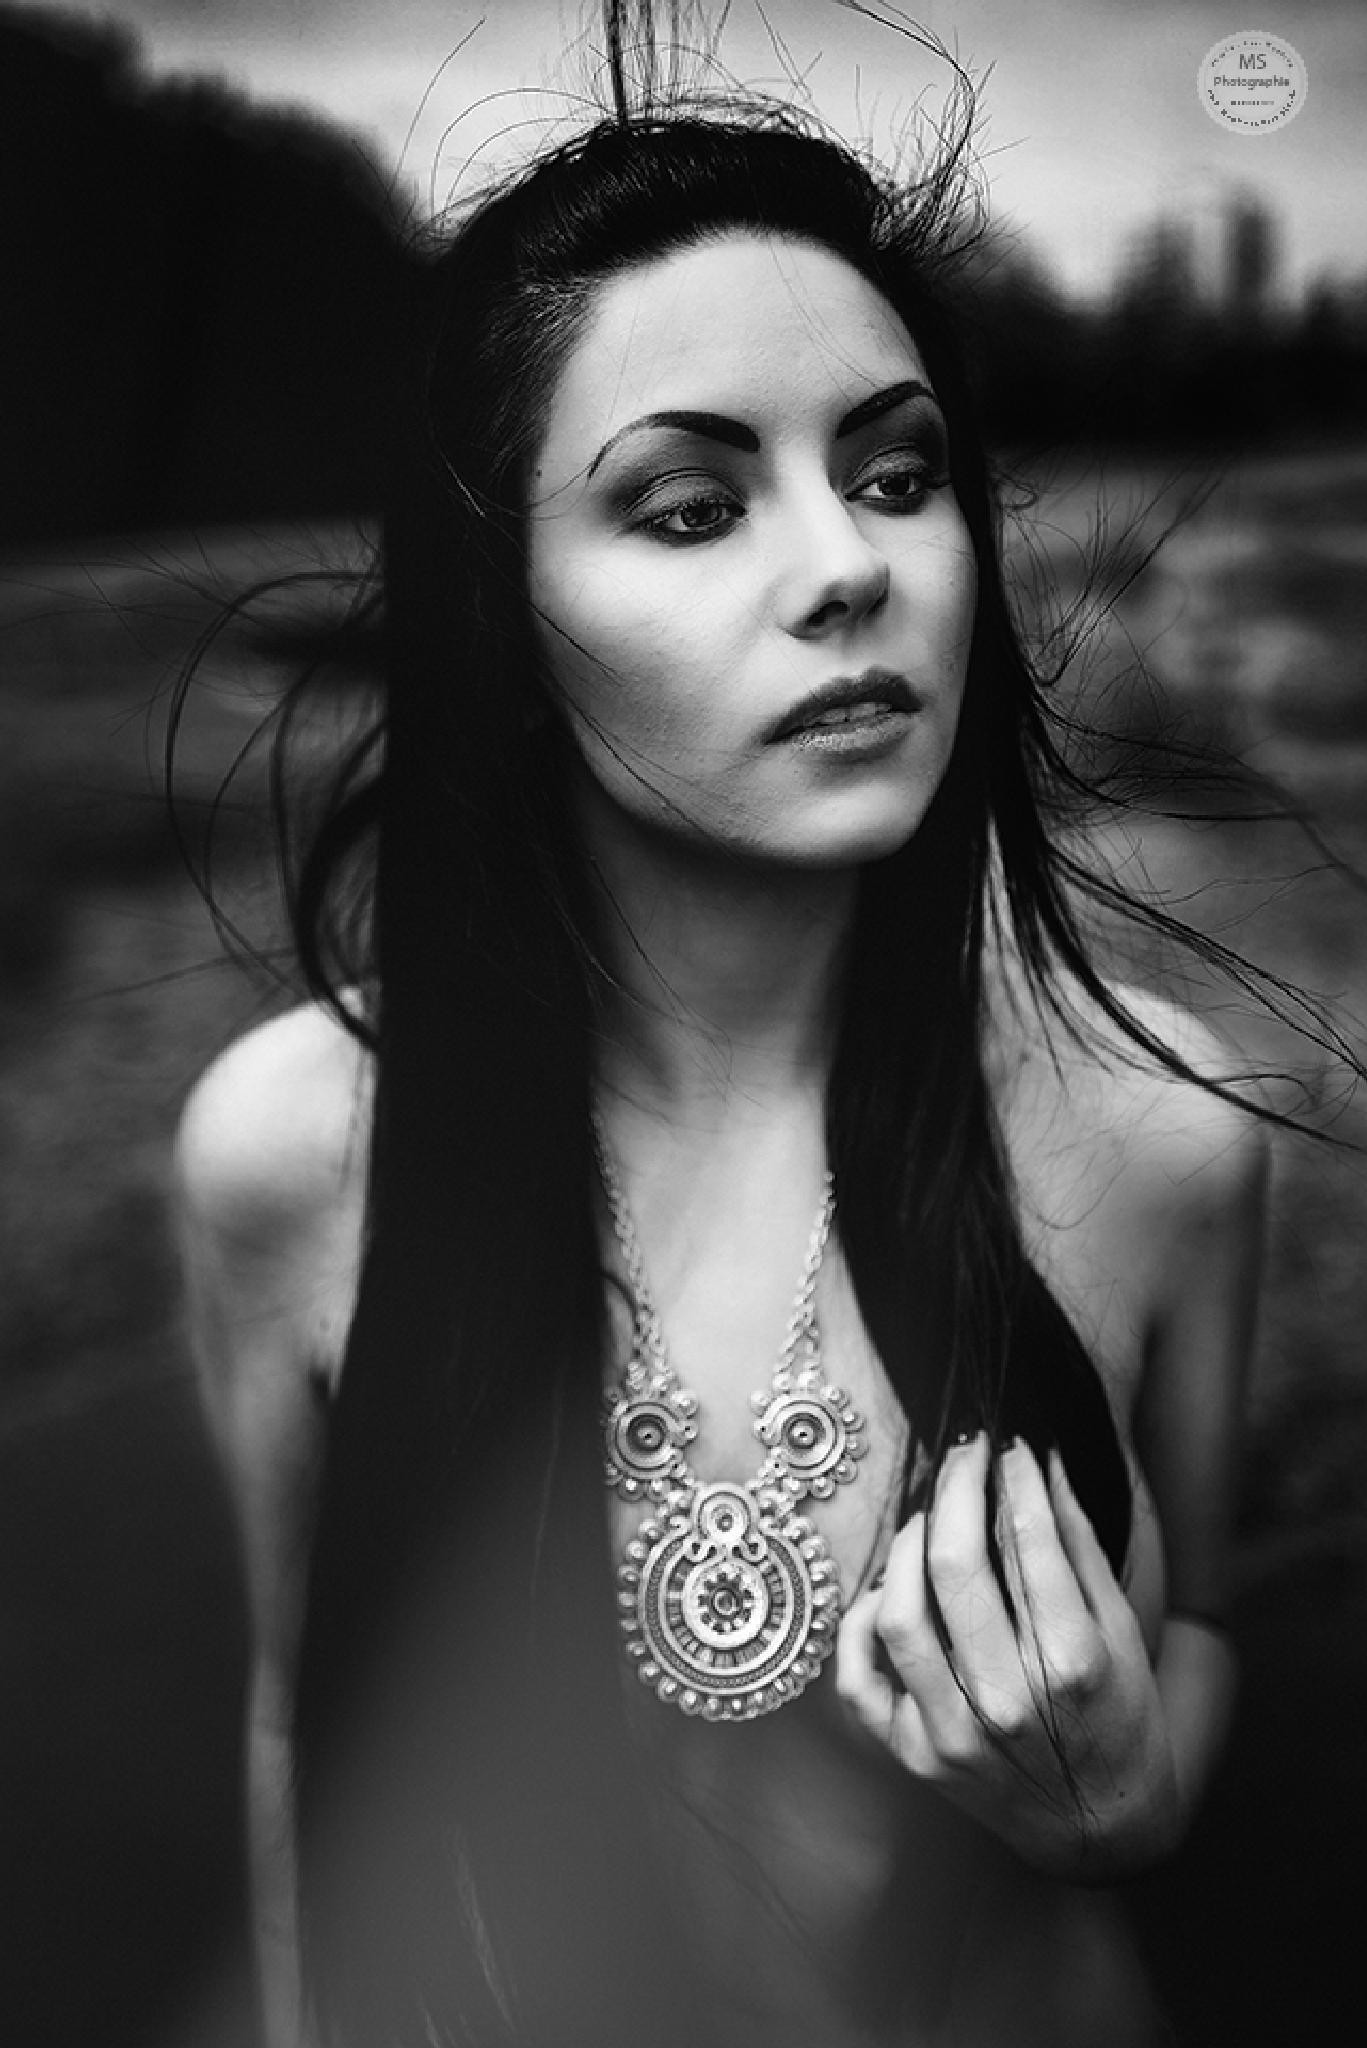 Female Nude - The Chain by Martin Slotta